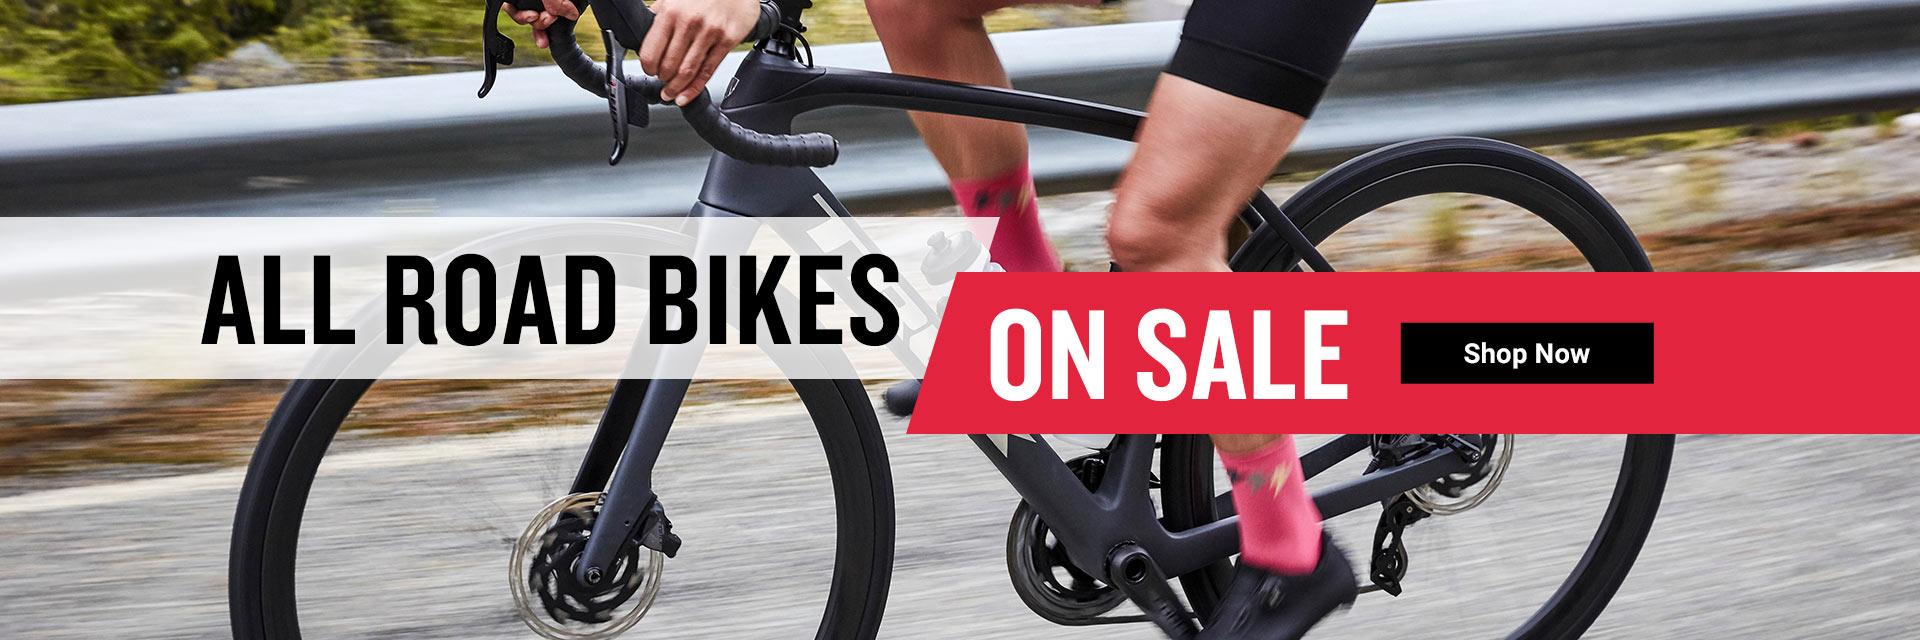 All road bikes on sale